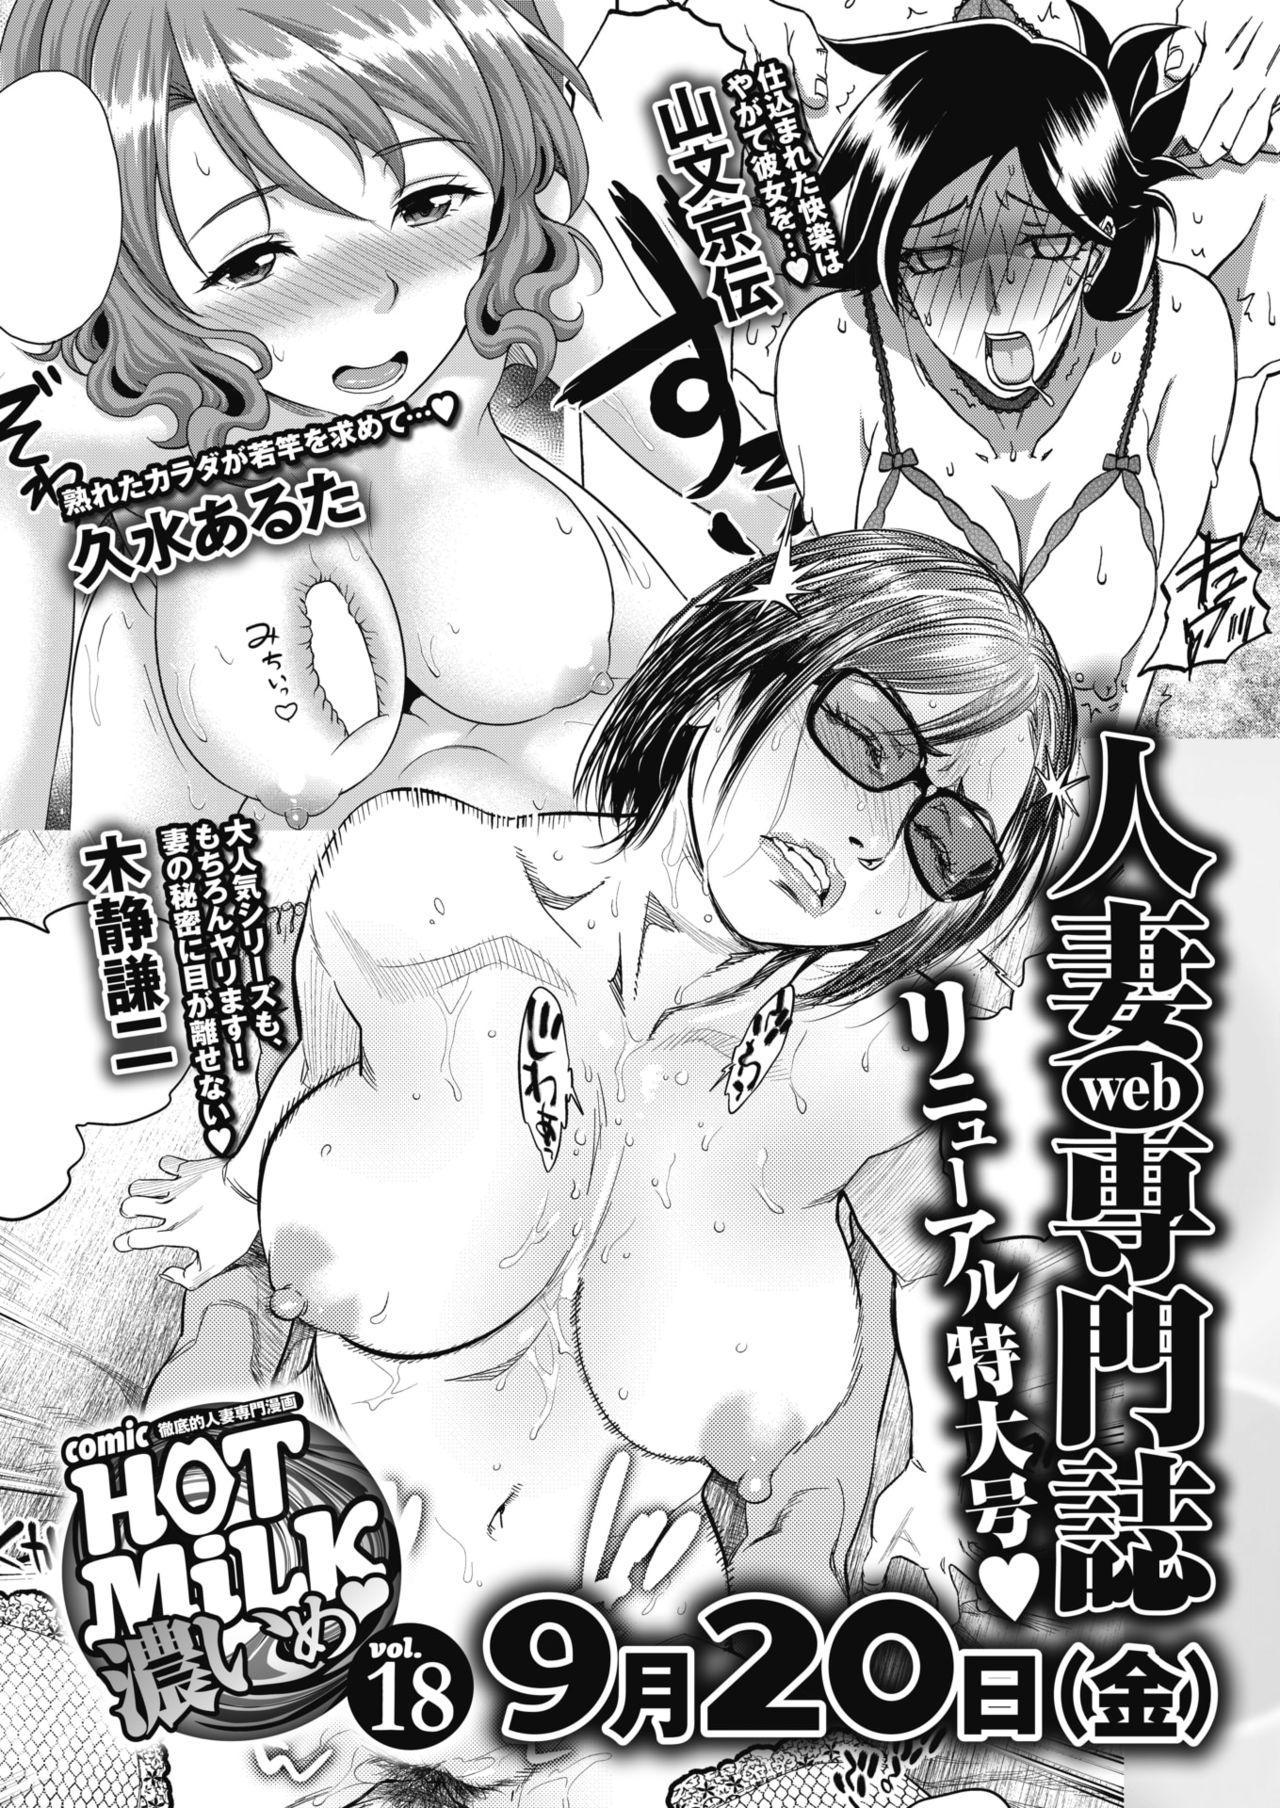 COMIC HOTMiLK Koime Vol. 17 235